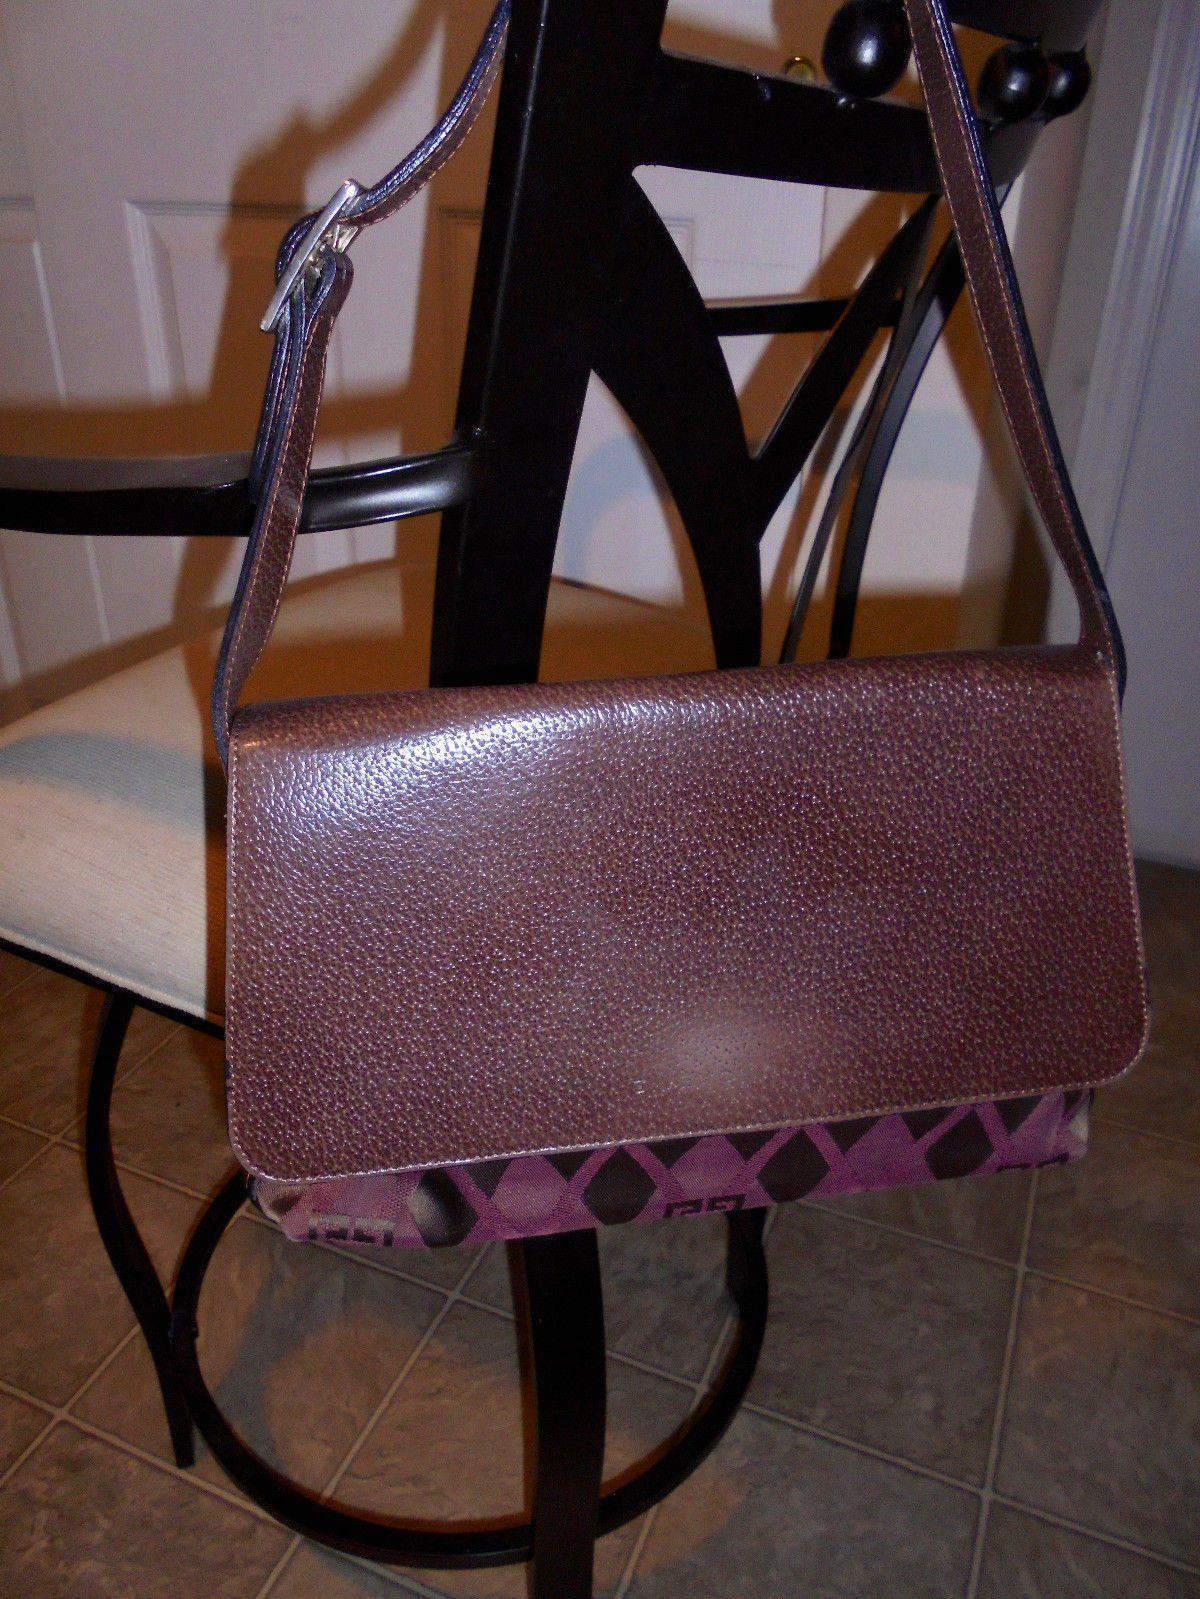 #Trending - Vintage Pebbled Leather Flap Signature GIVENCHY Shoulder Bag Purse https://t.co/9kd9fwMYp6 #Ebay https://t.co/duLzYfVvyQ